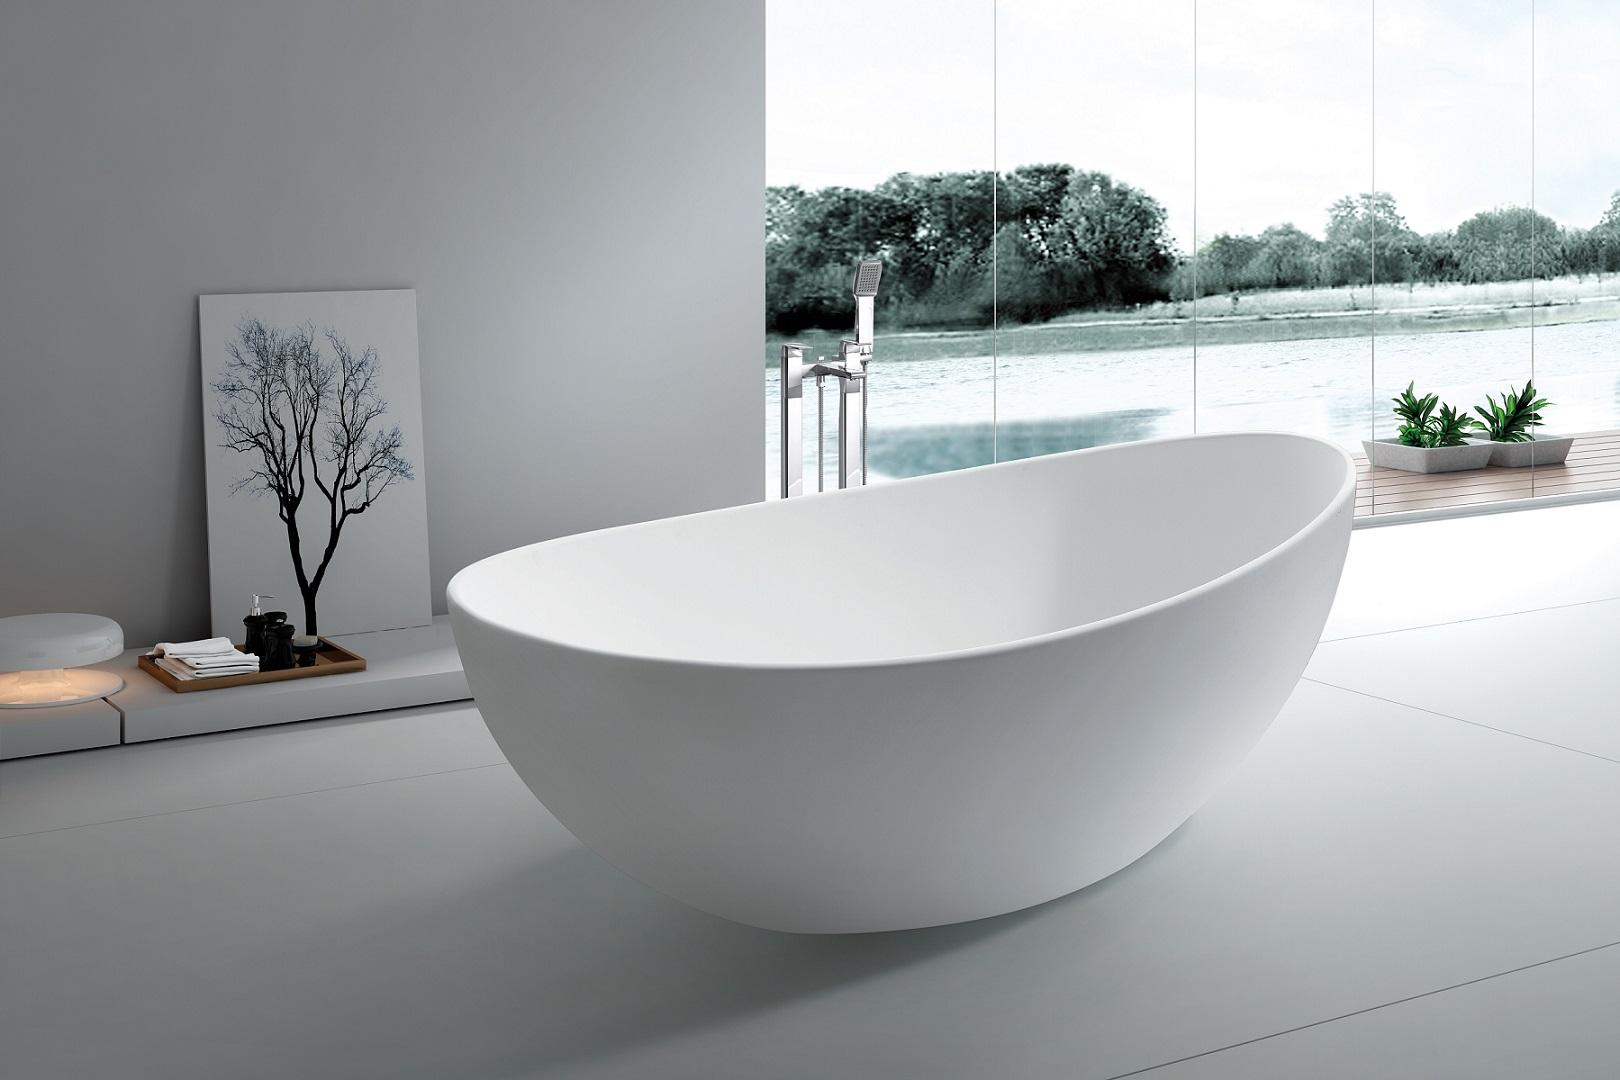 Permalink to Modern Freestanding Bathtubs For Sale